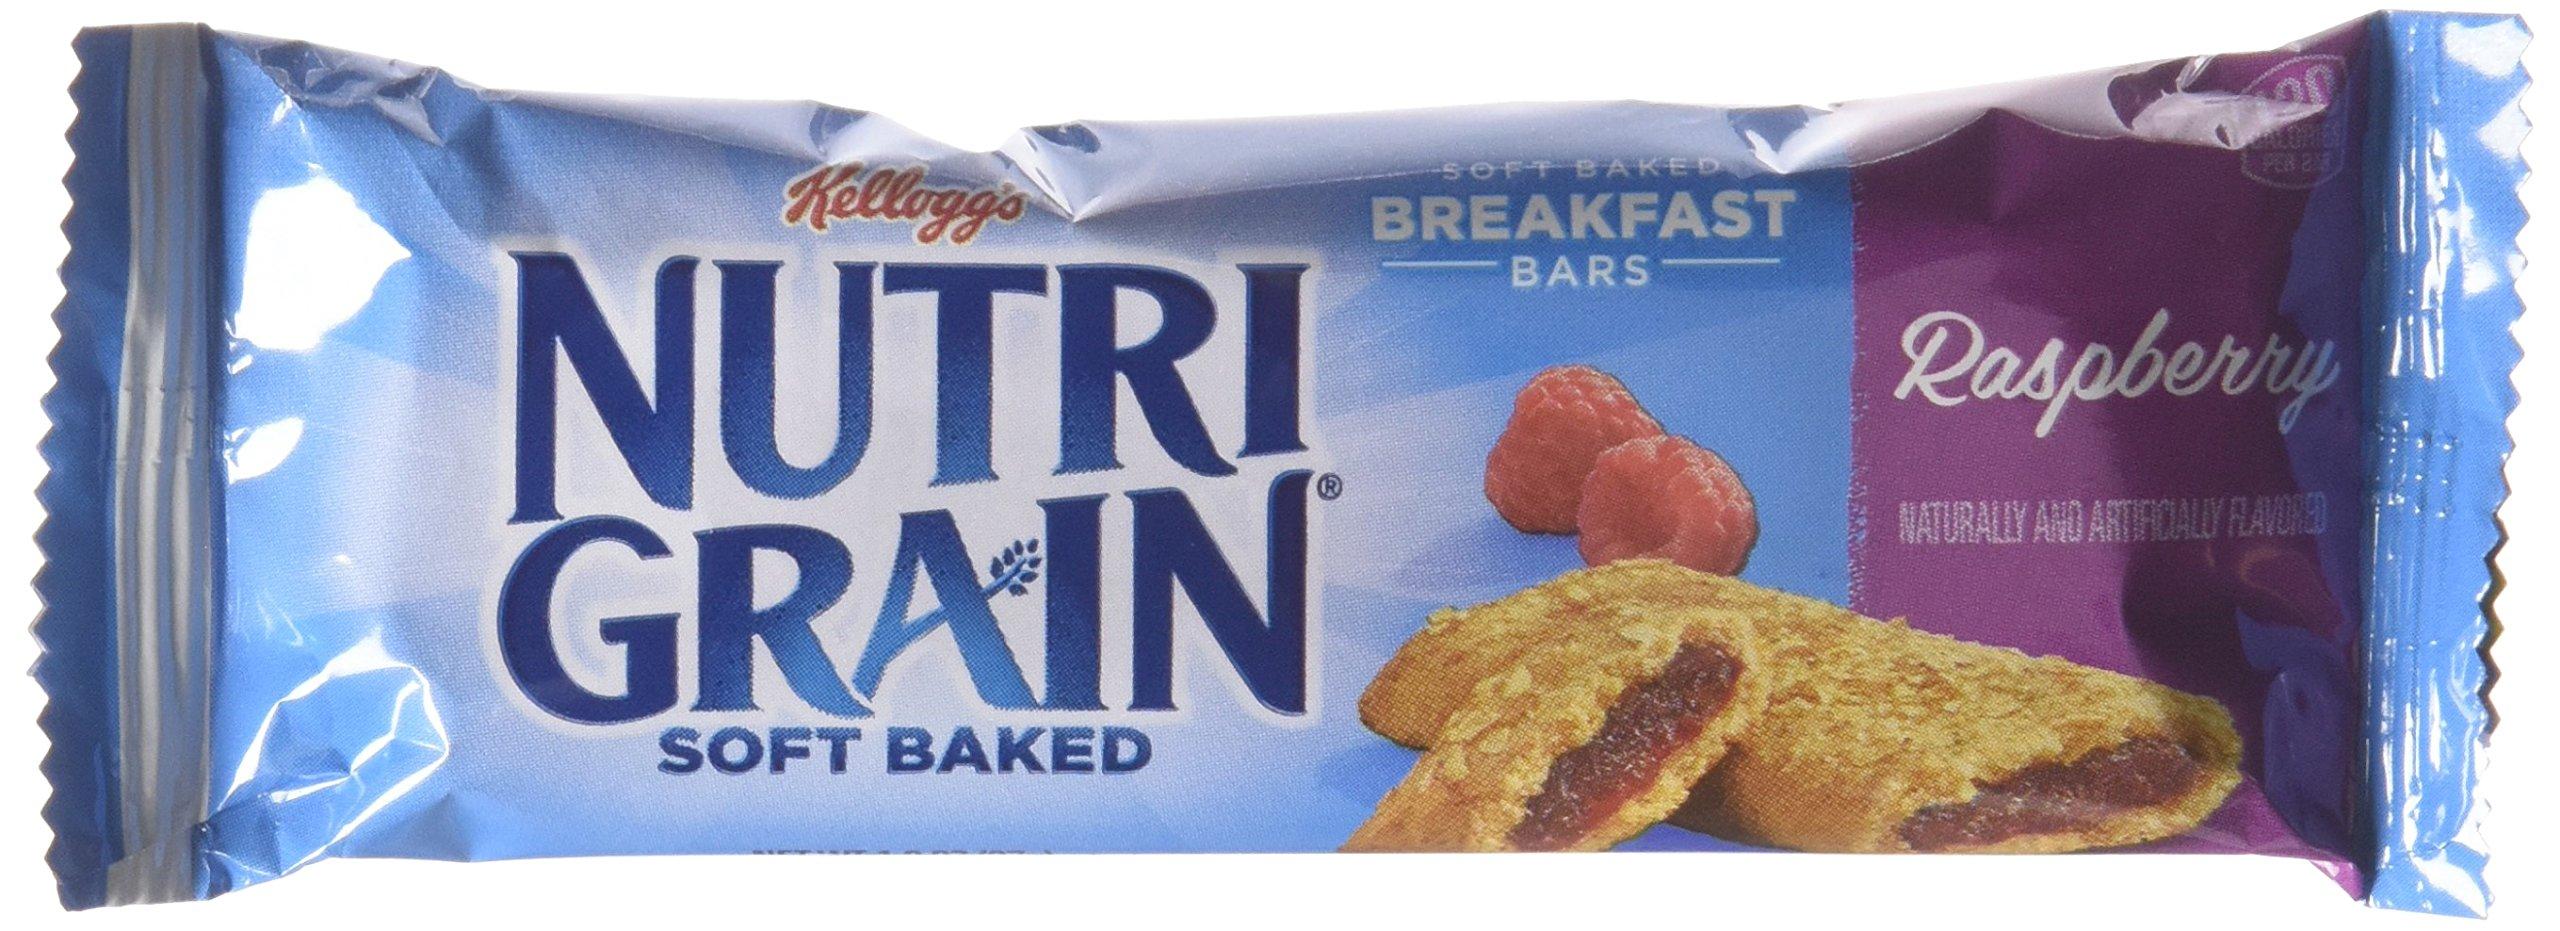 Kellogg's Nutri-Grain Cereal Breakfast Bars, Raspberry, 8 Count (Pack of 6) by Nutri-Grain